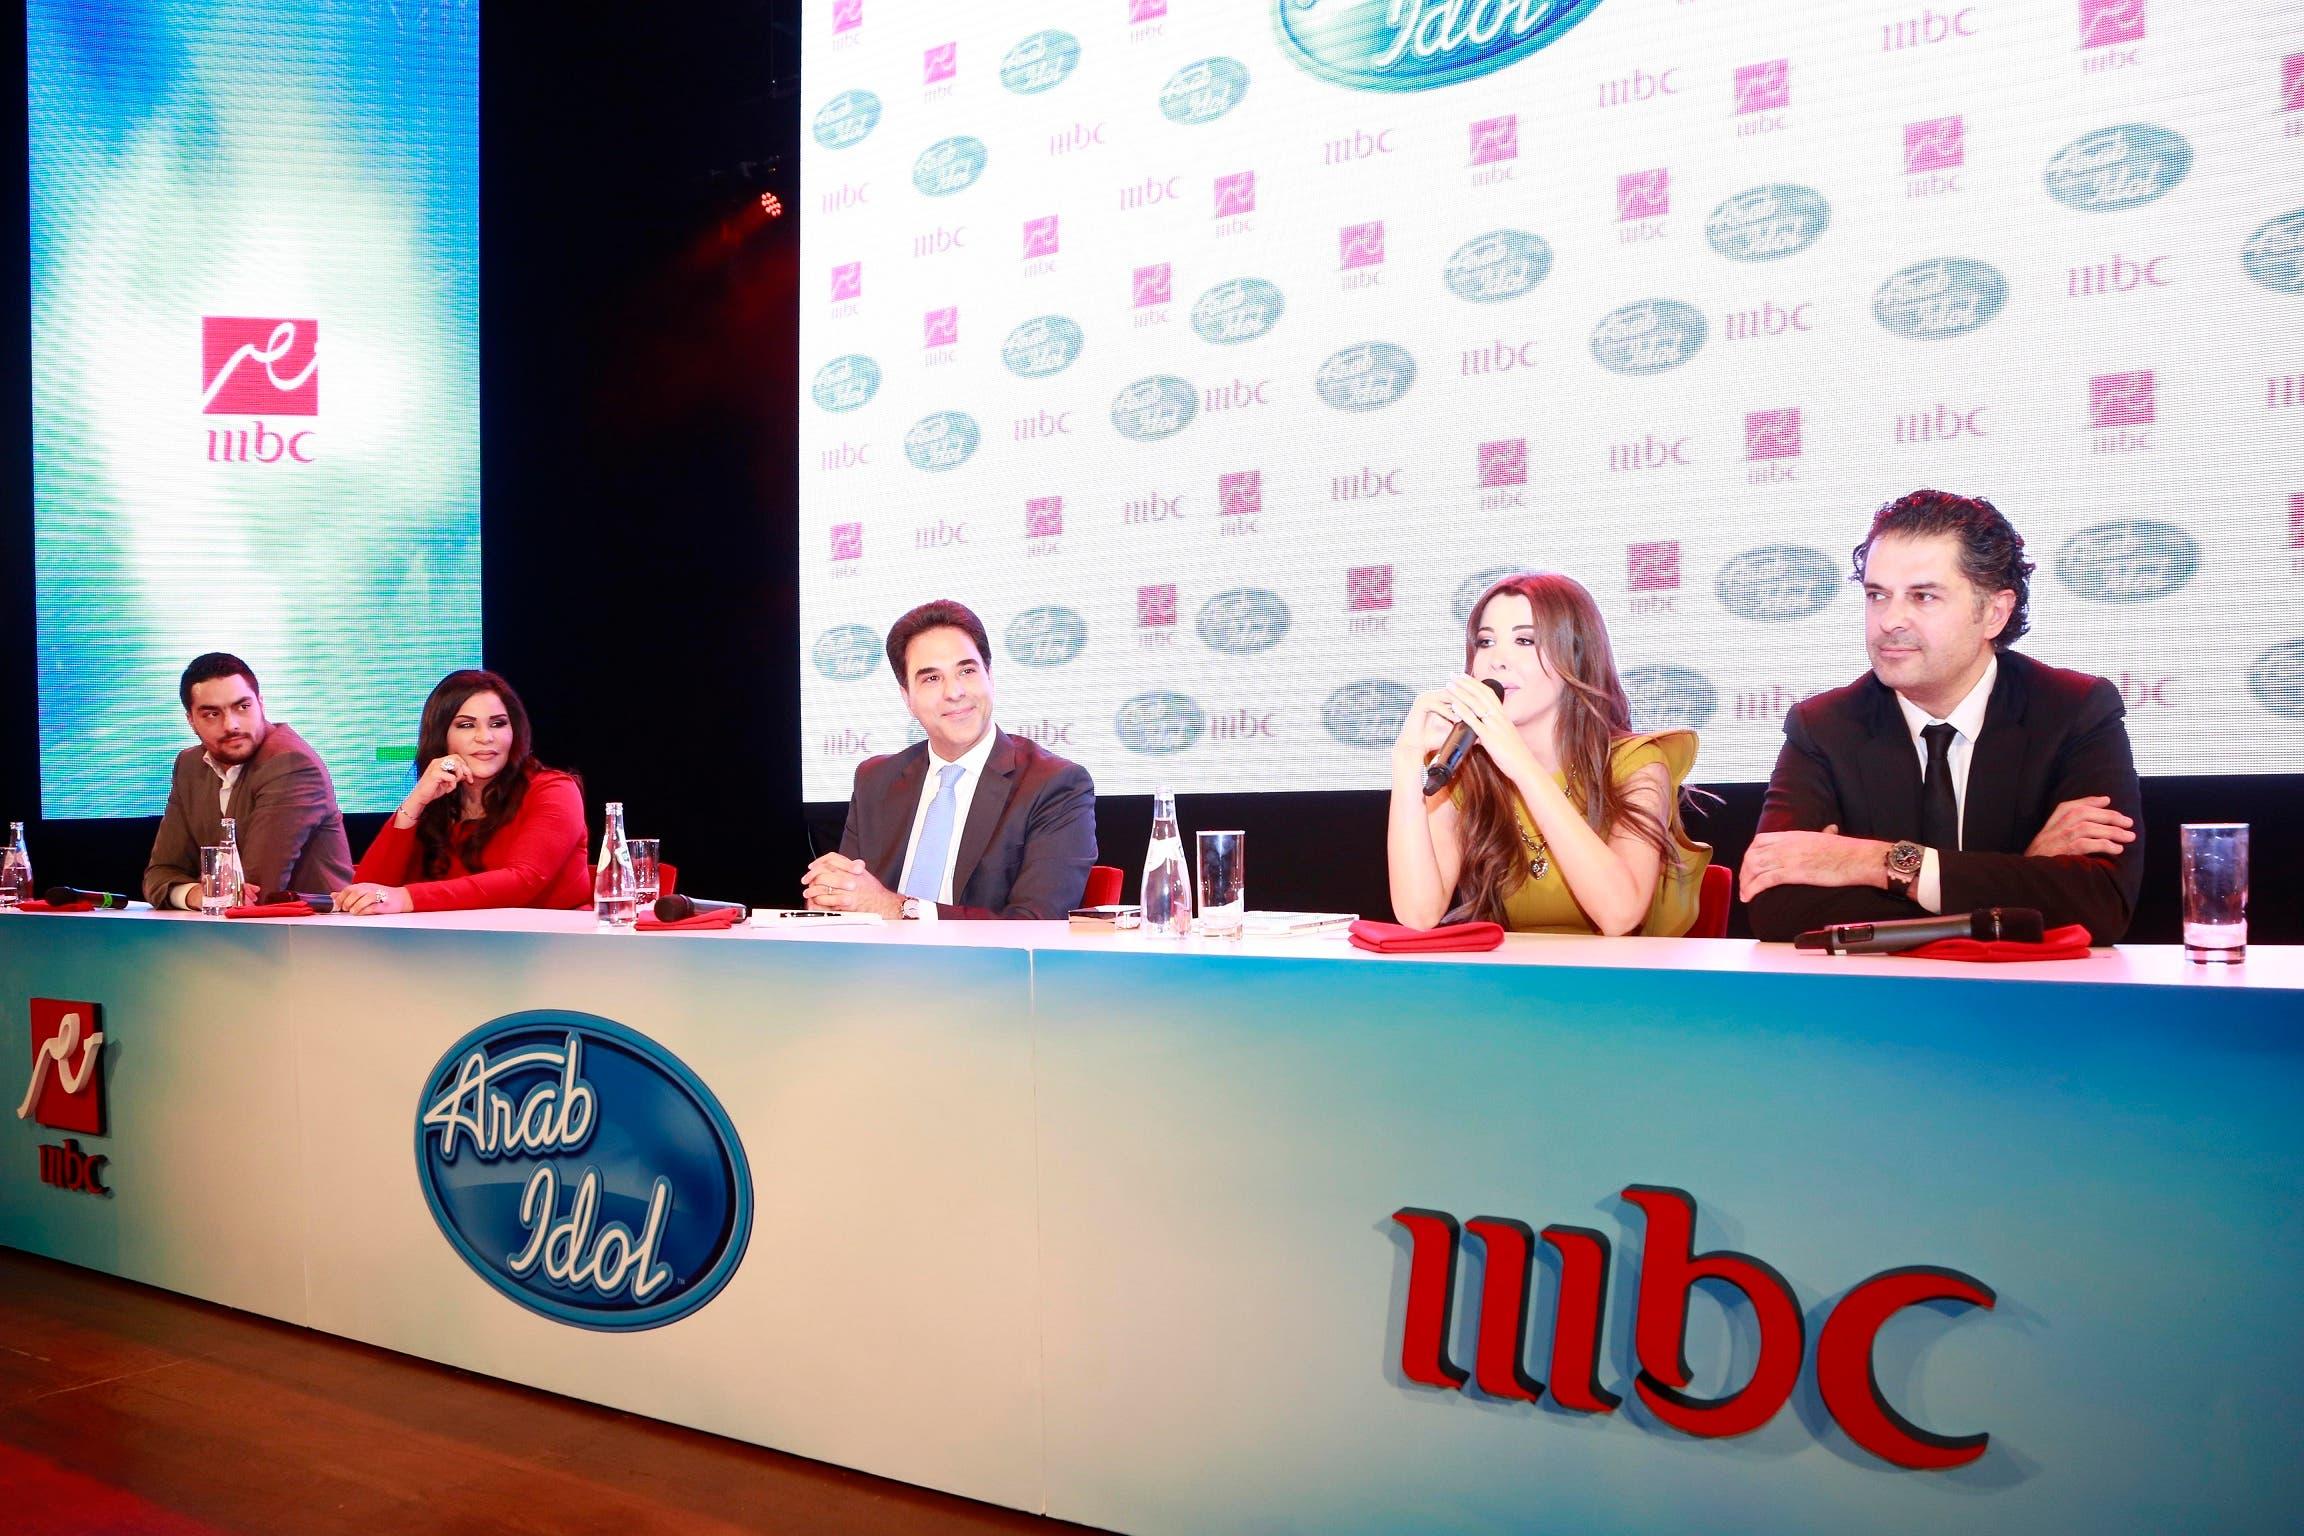 At a MBC1/MBC Masr Arab Idol 2 press conference